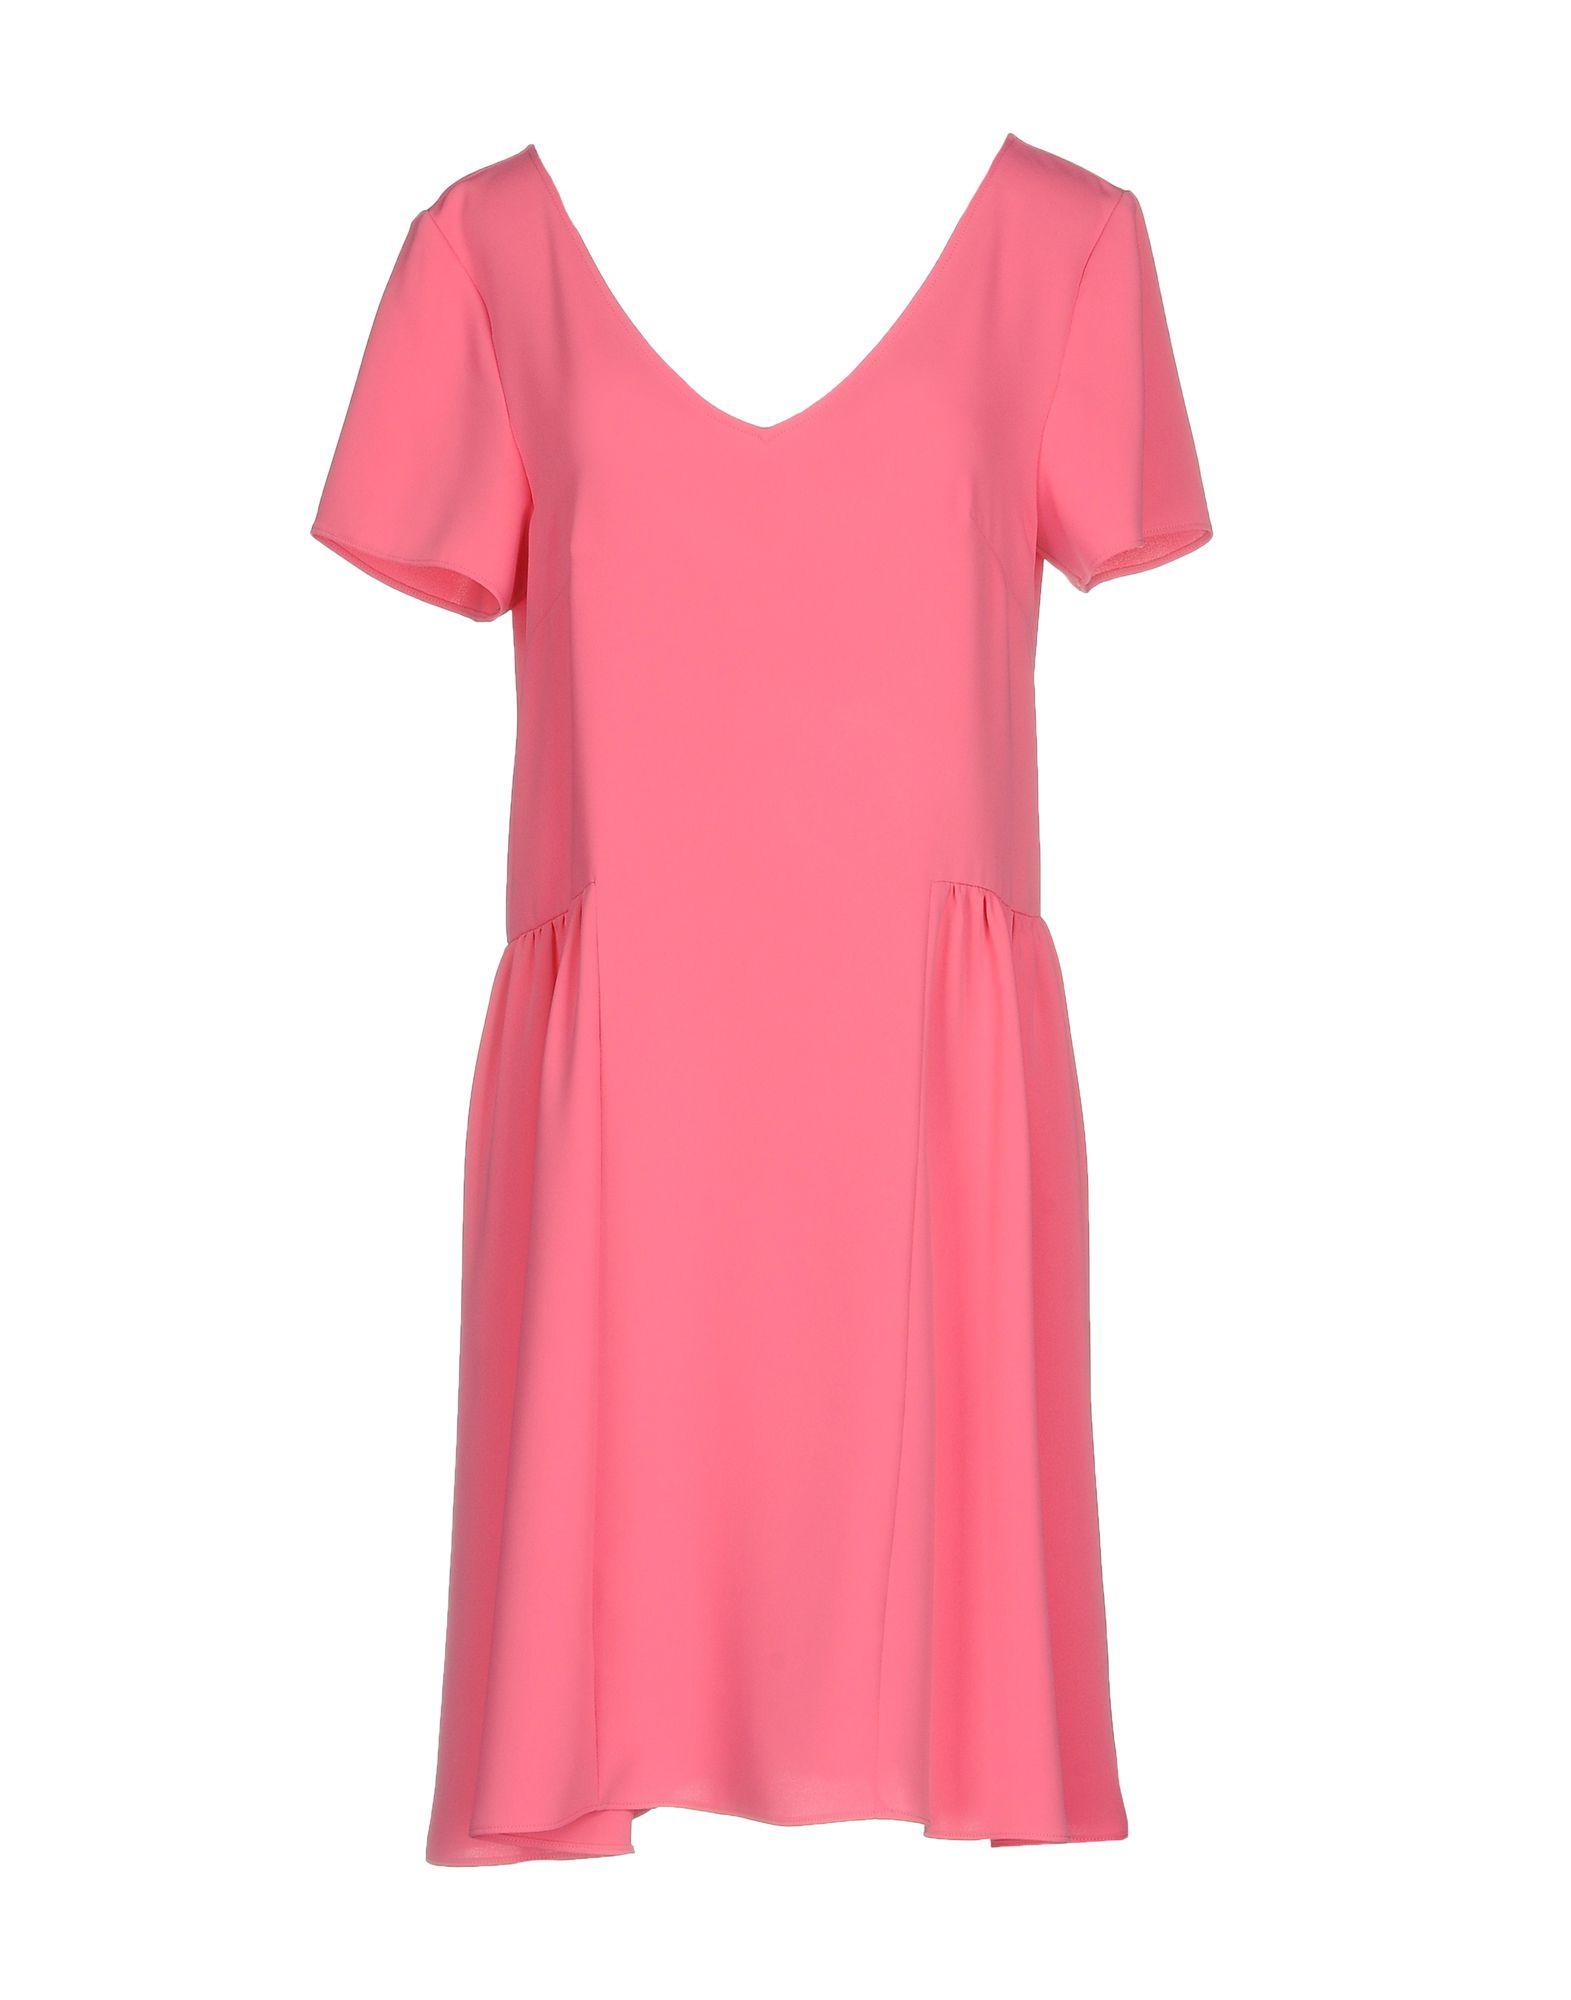 ФОТО p.a.r.o.s.h. короткое платье